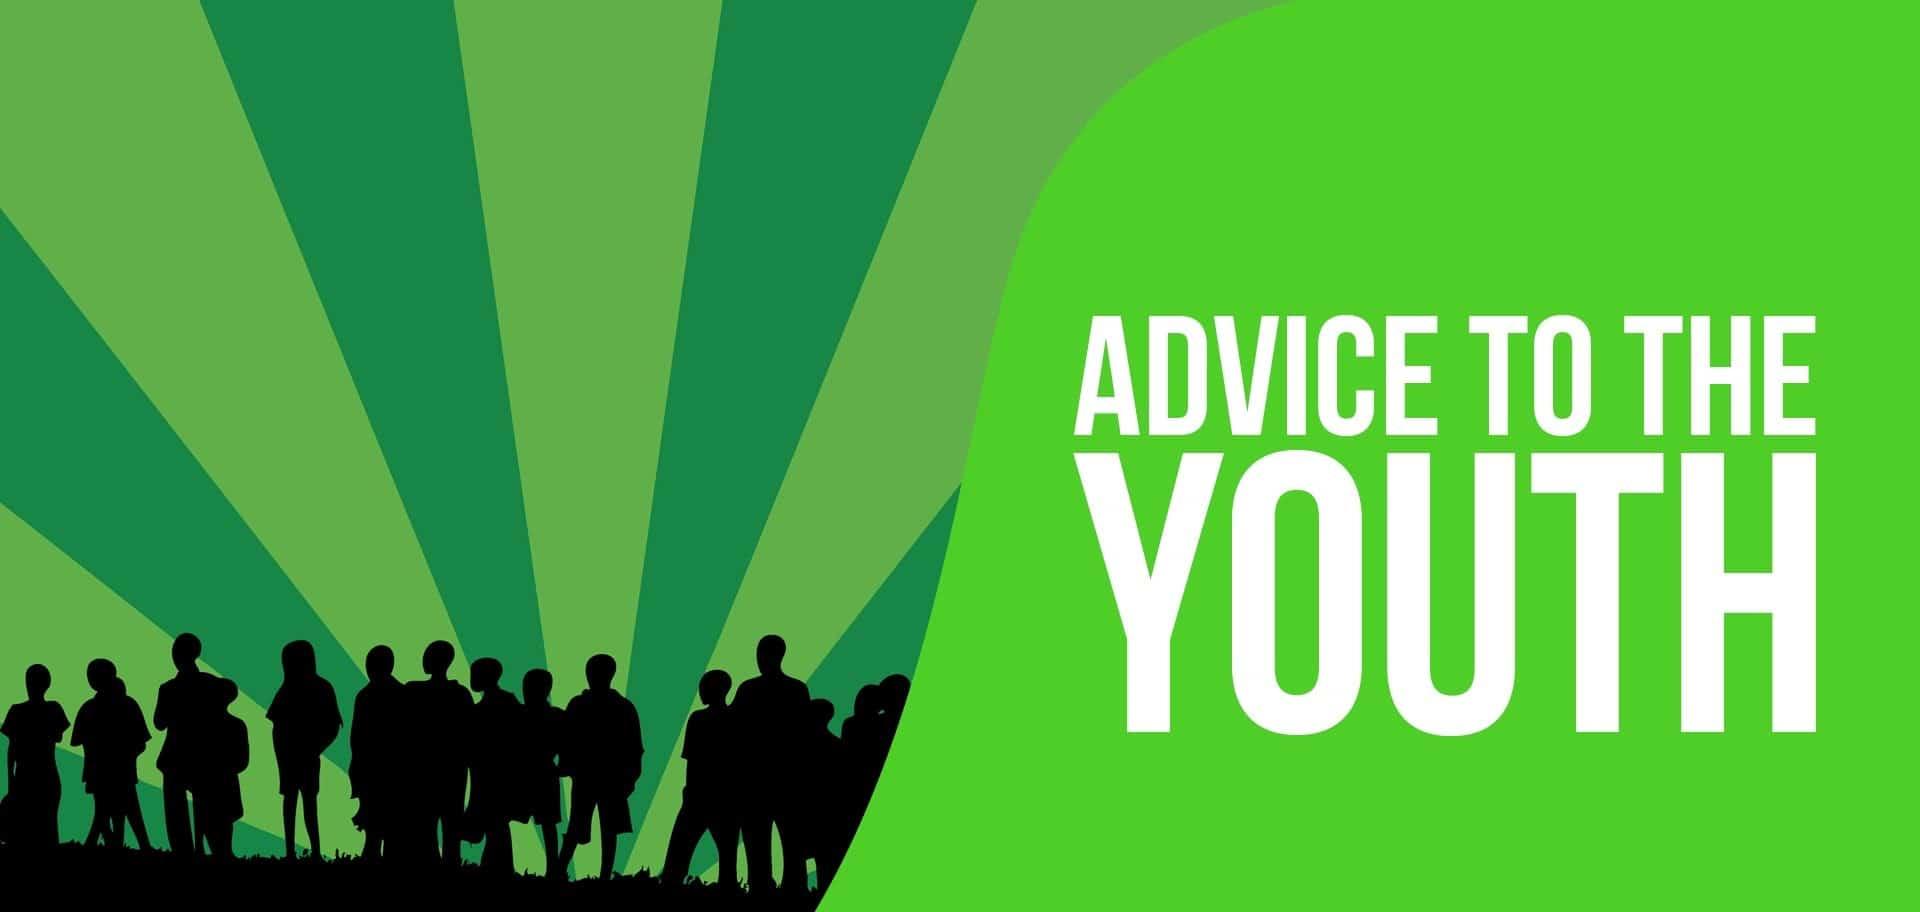 Imam al-Ghazali's Advice to the Youth